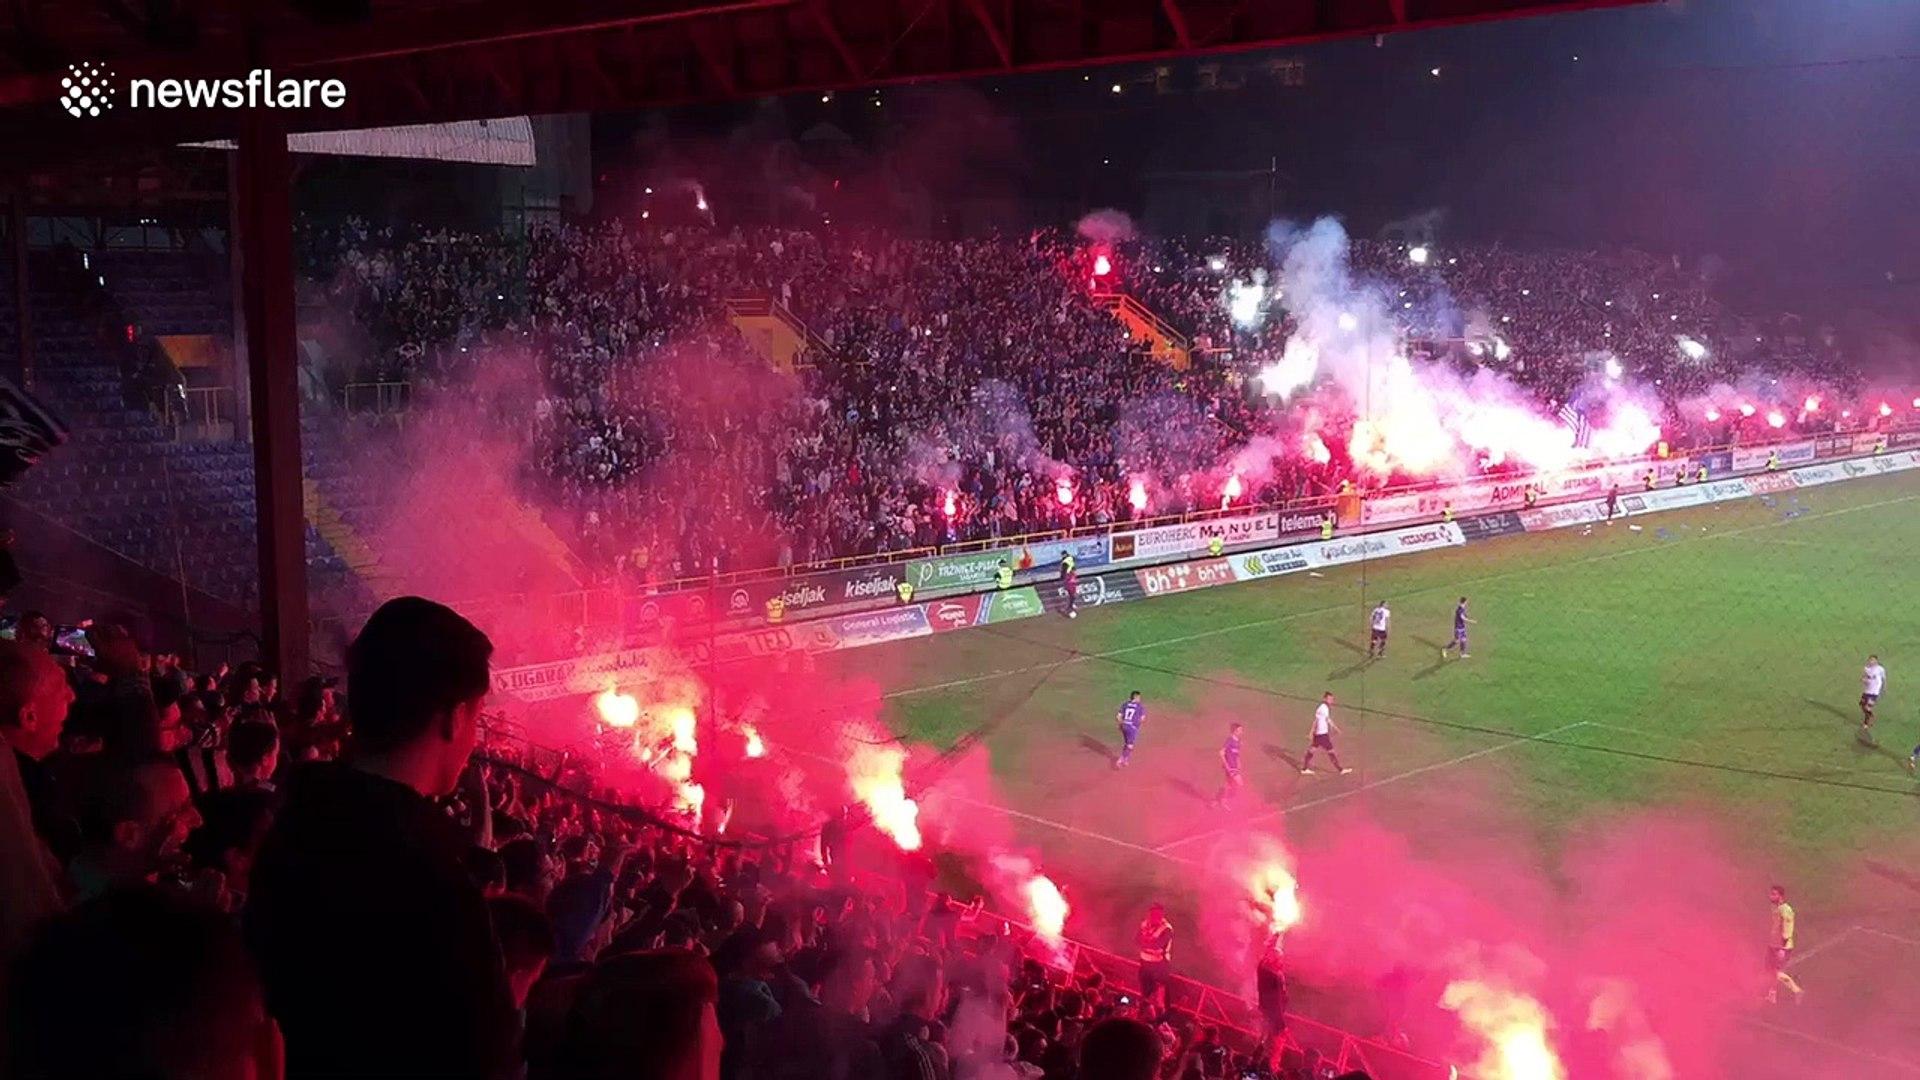 Unbelievable football atmosphere in Sarajevo